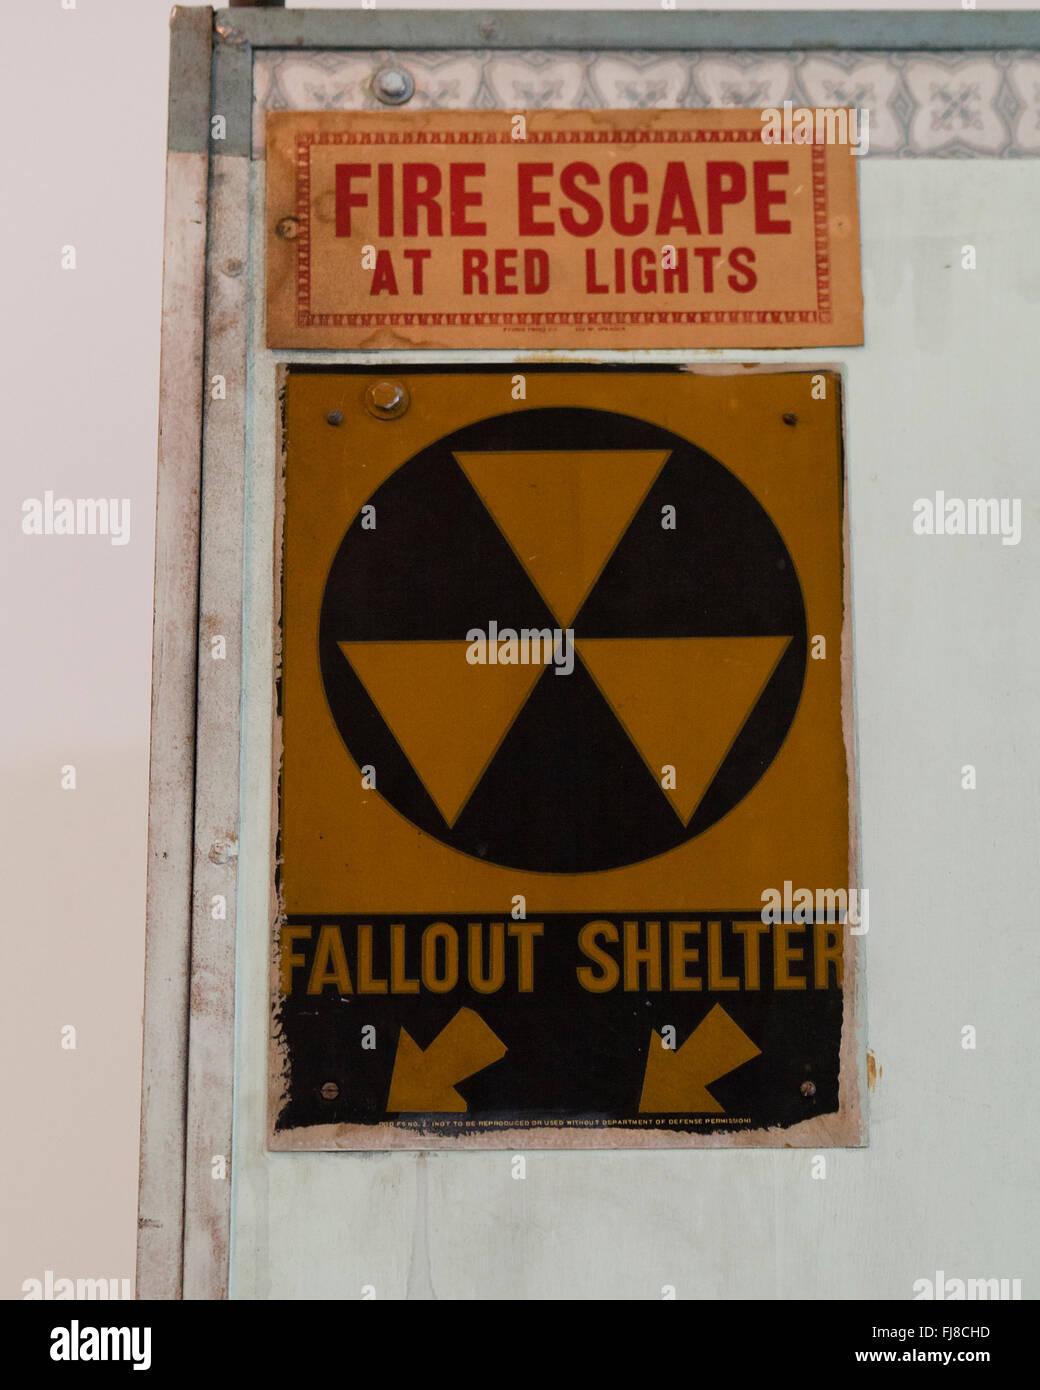 Fallout shelter sign on building entrance - Washington DC Stock Photo